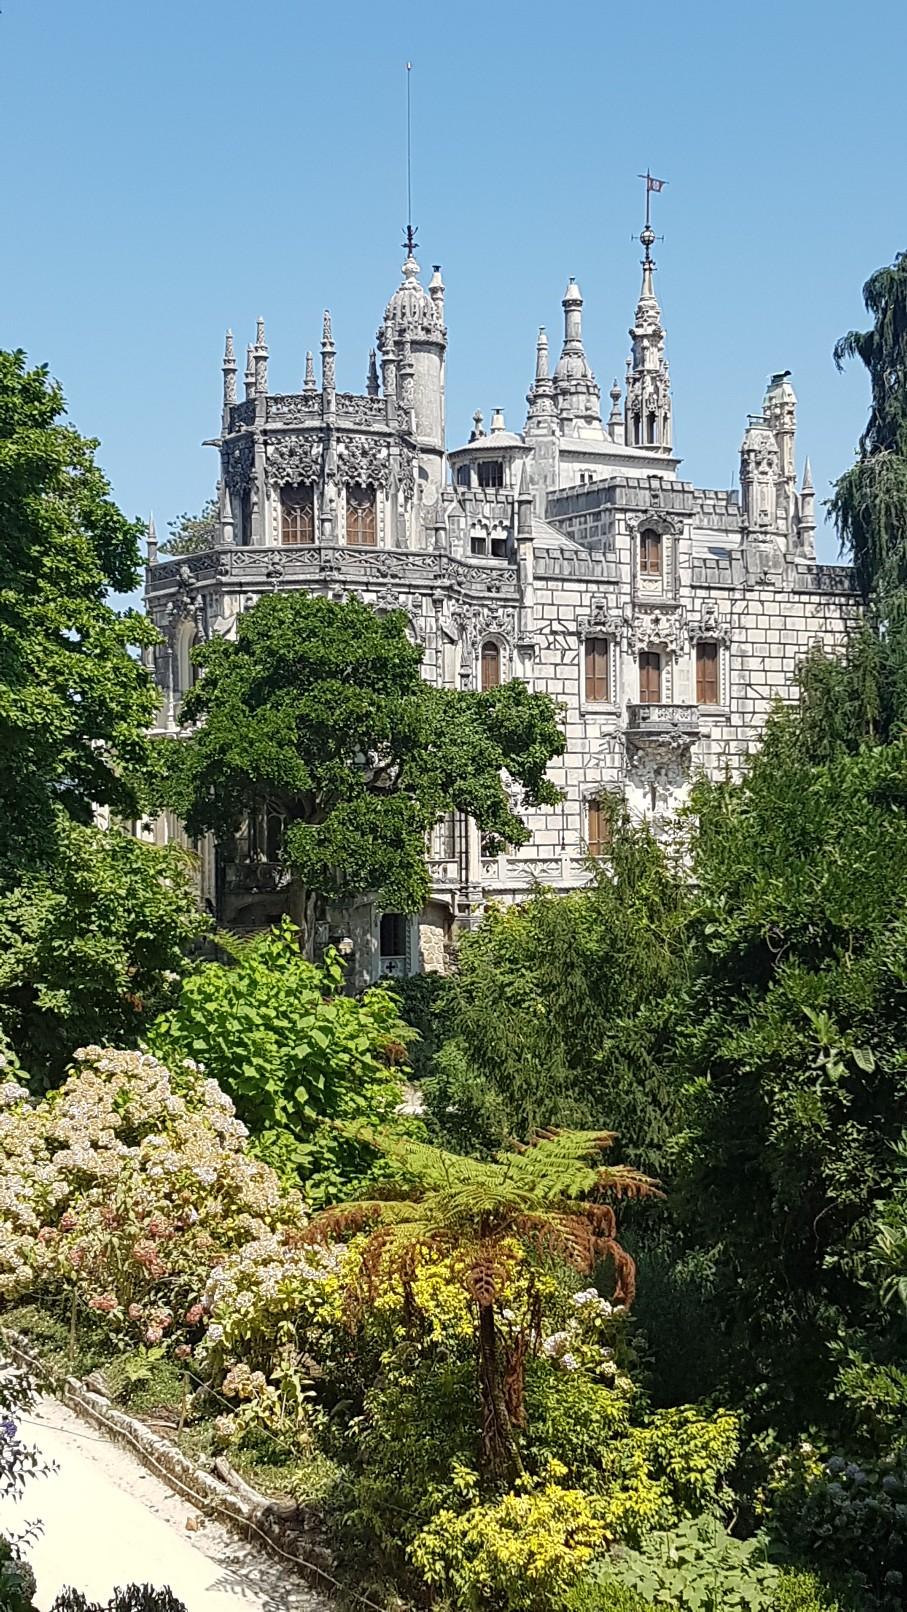 (Portugal) Jardins et palais da Regaleira - Sintra 20180270